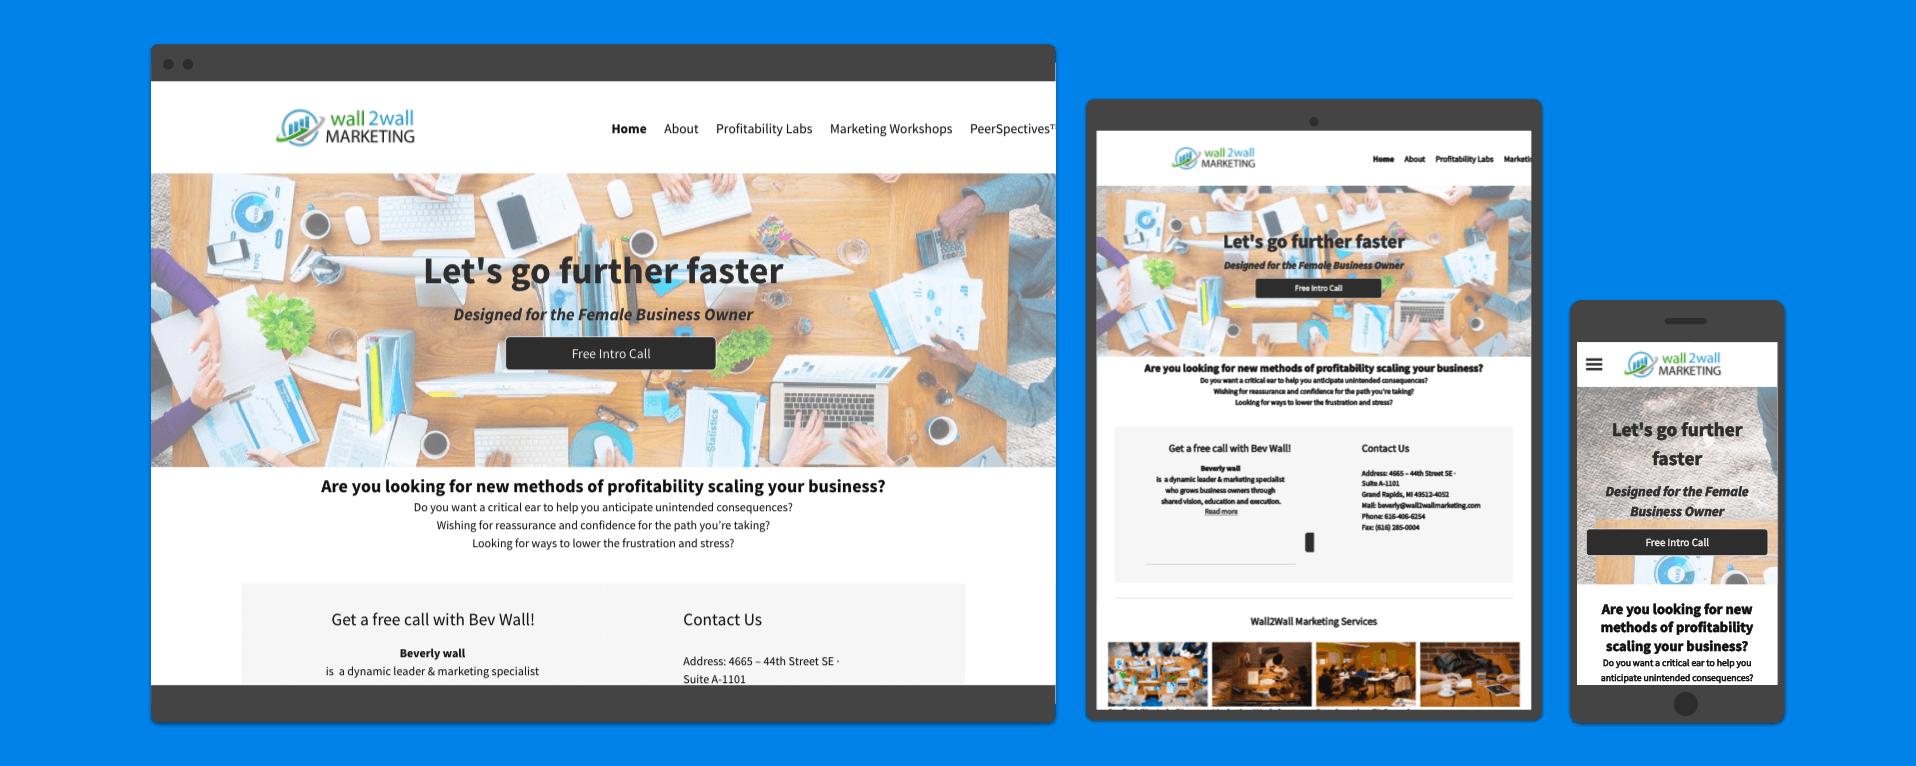 Web Development Portfolio - Marketing Company